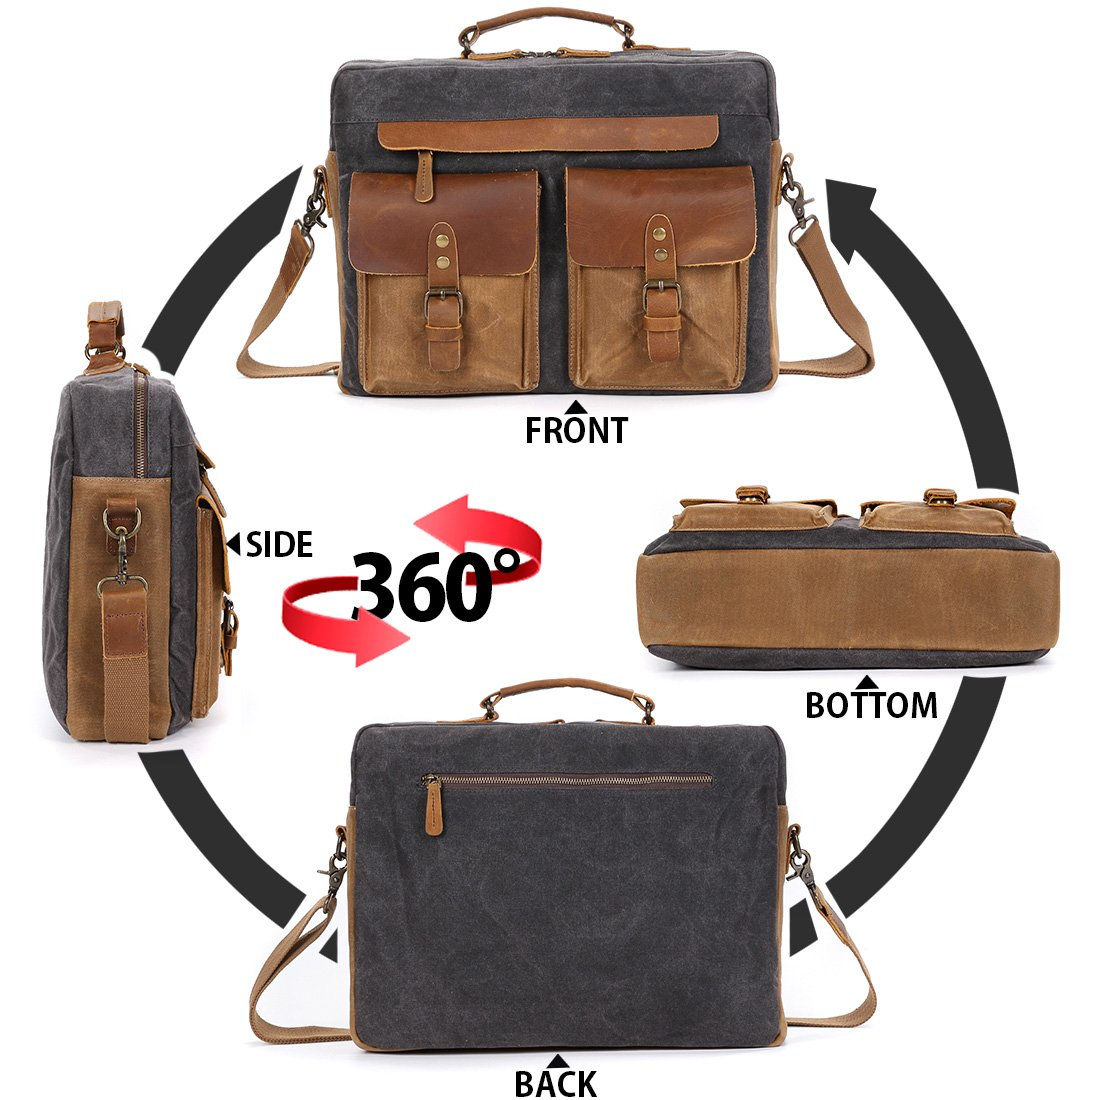 4c6d193766 NEWHEY Mens 15.6 Laptop Messenger Bag Water Resistant Shoulder Computer  School Work Bags Canvas Leather Briefcase Vintage Satchel Grey